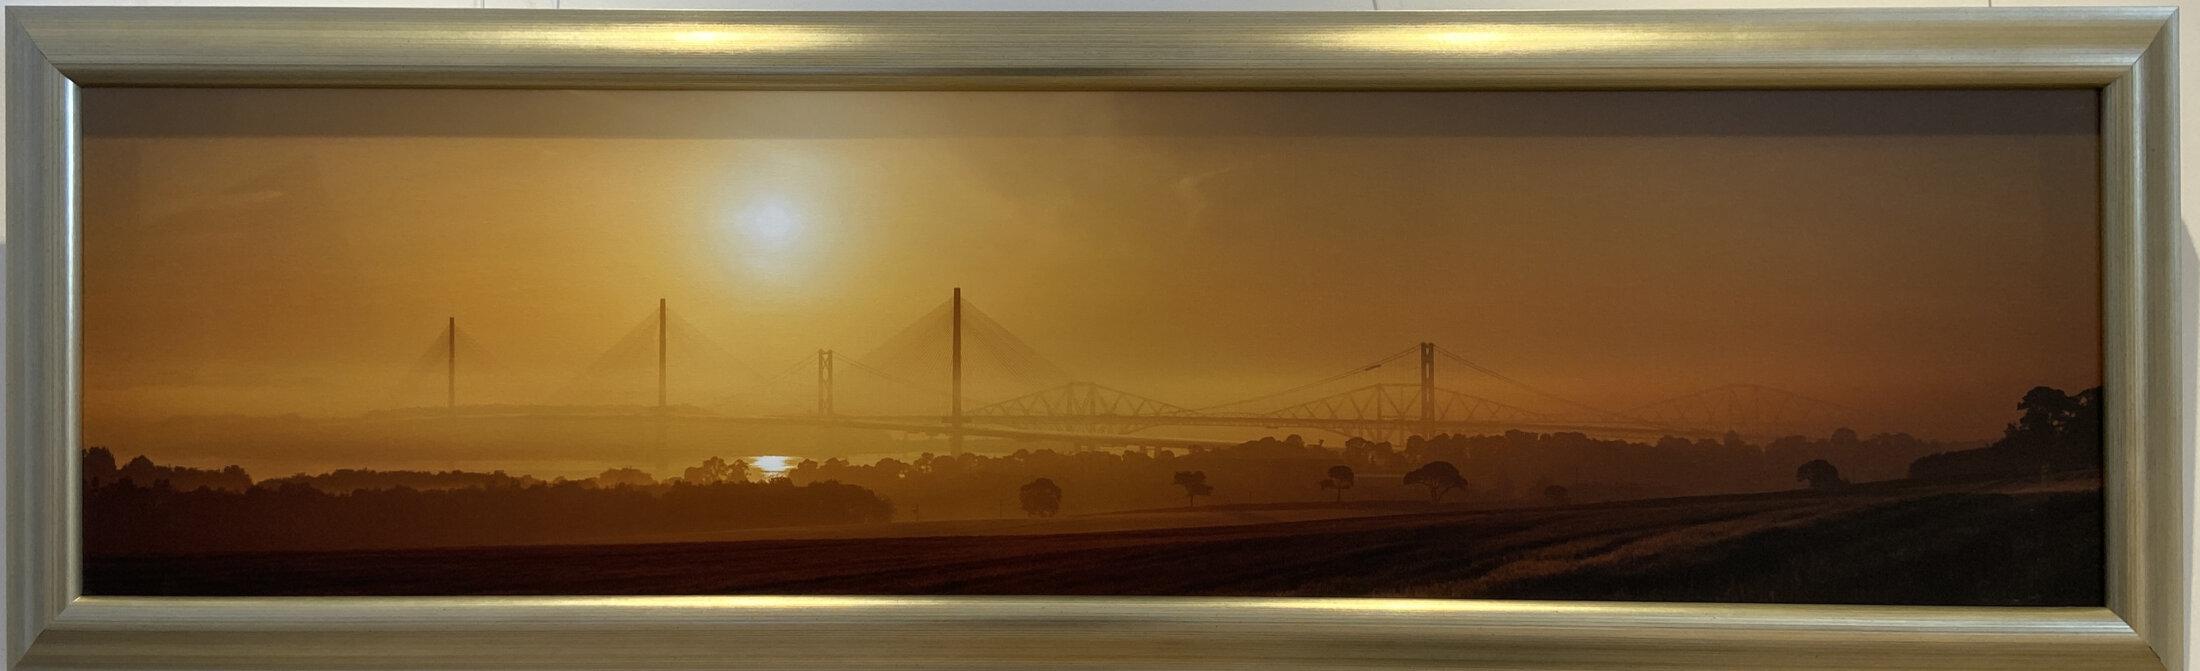 John Gilchrist - The Bridges